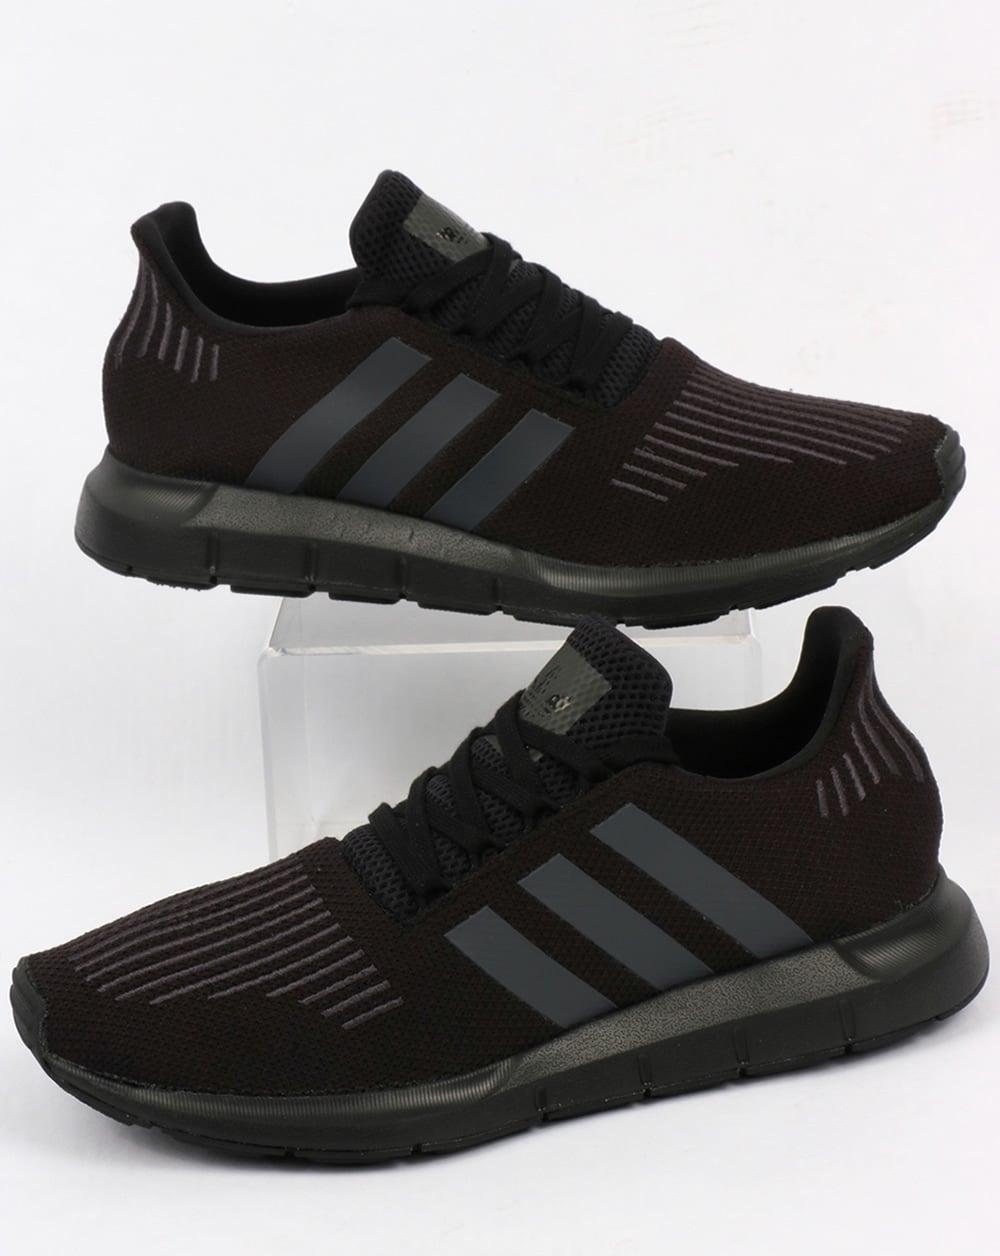 880ac7b76184 adidas Trainers Adidas Swift Run Trainers Black